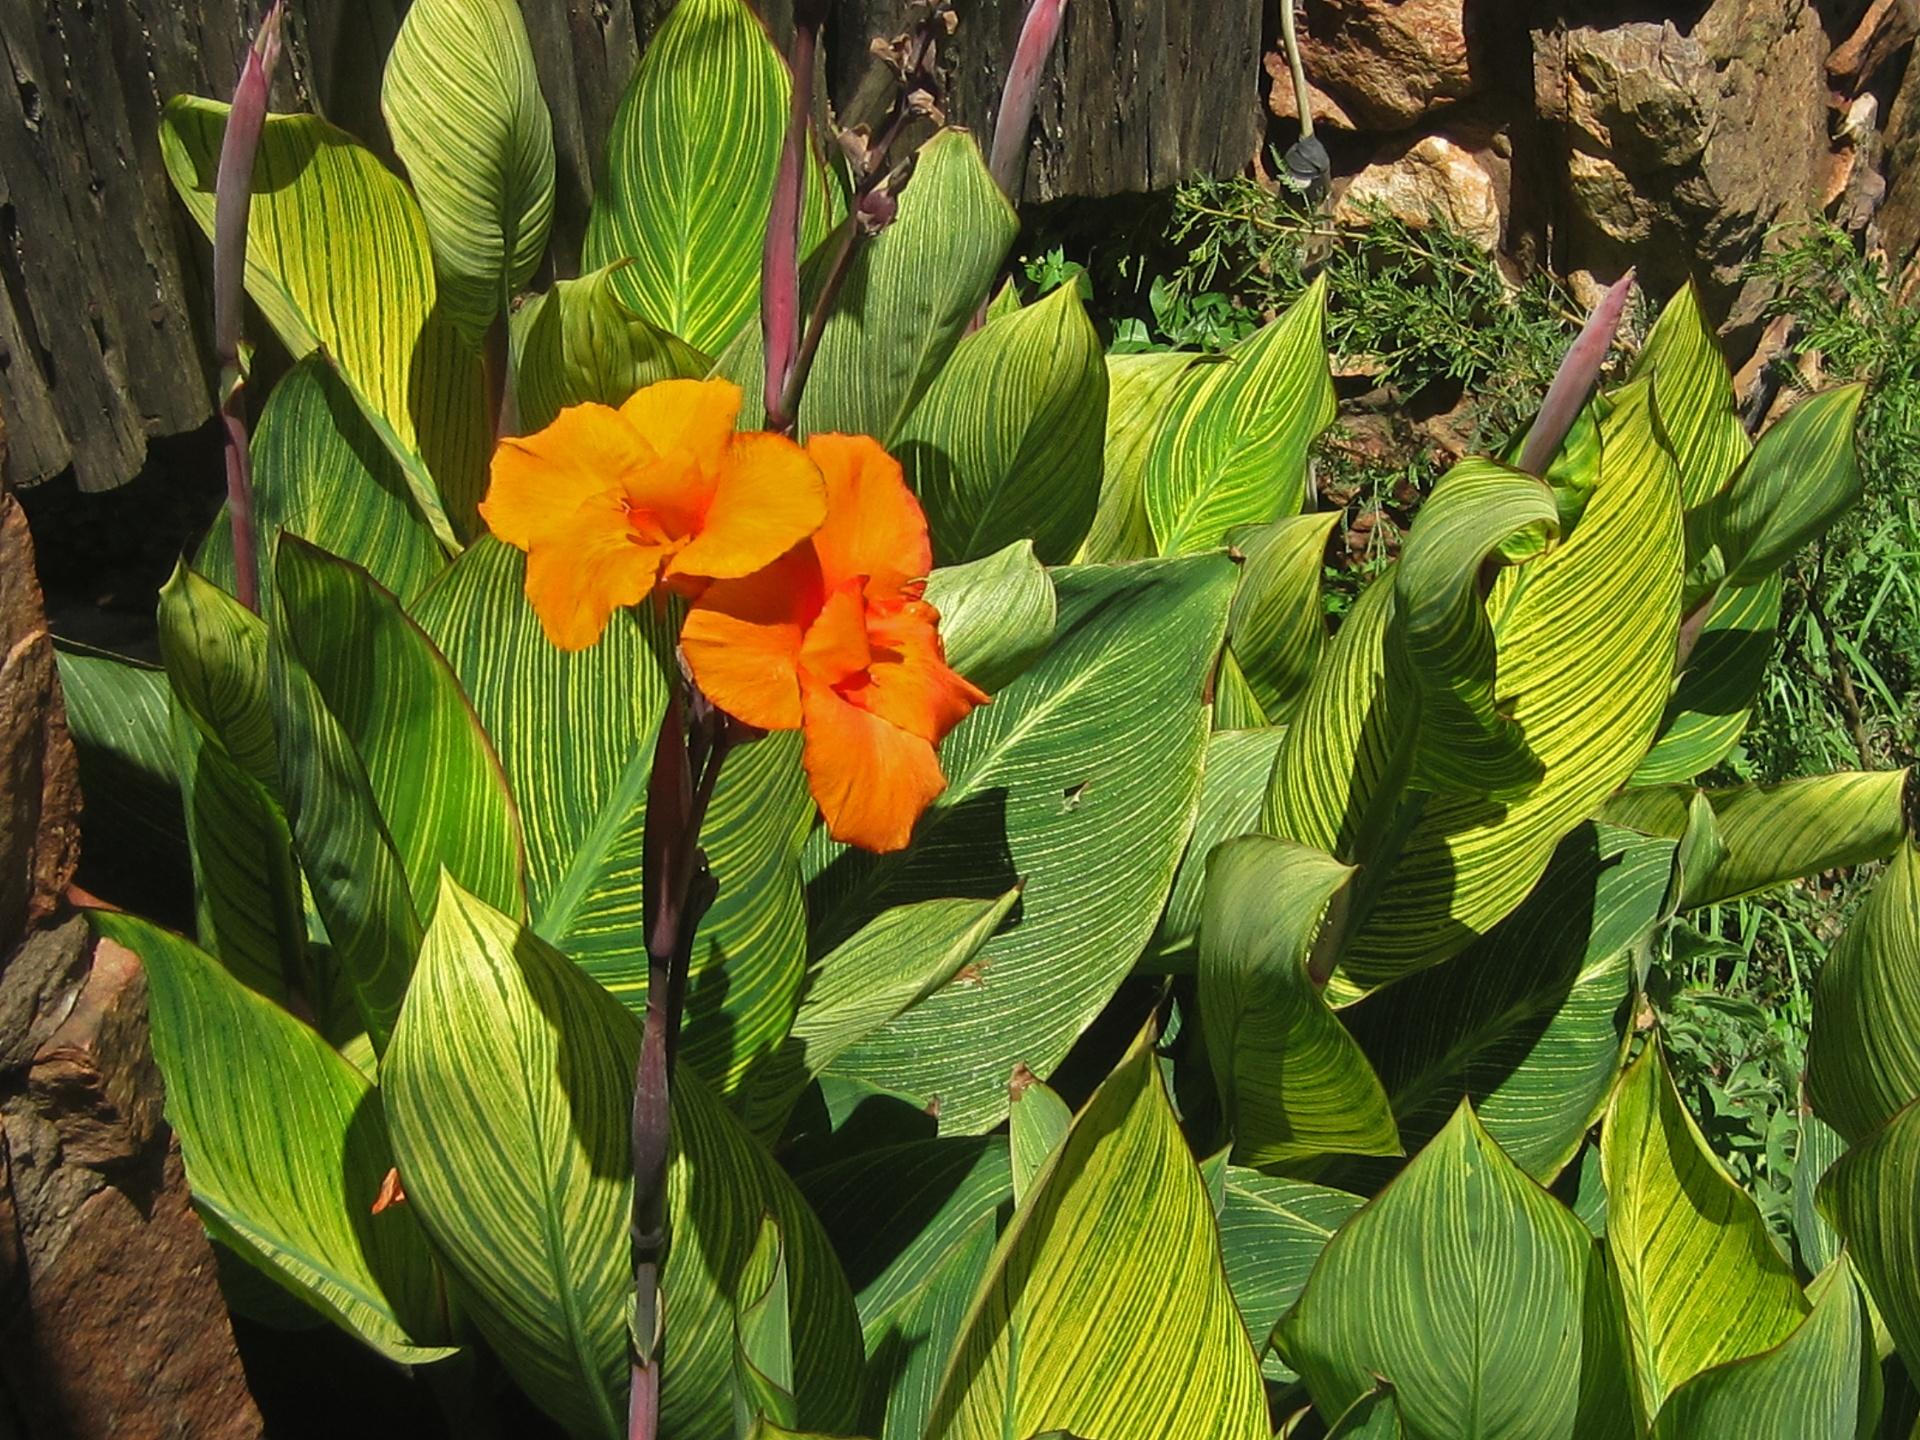 La Canna indica es una planta rizomatosa